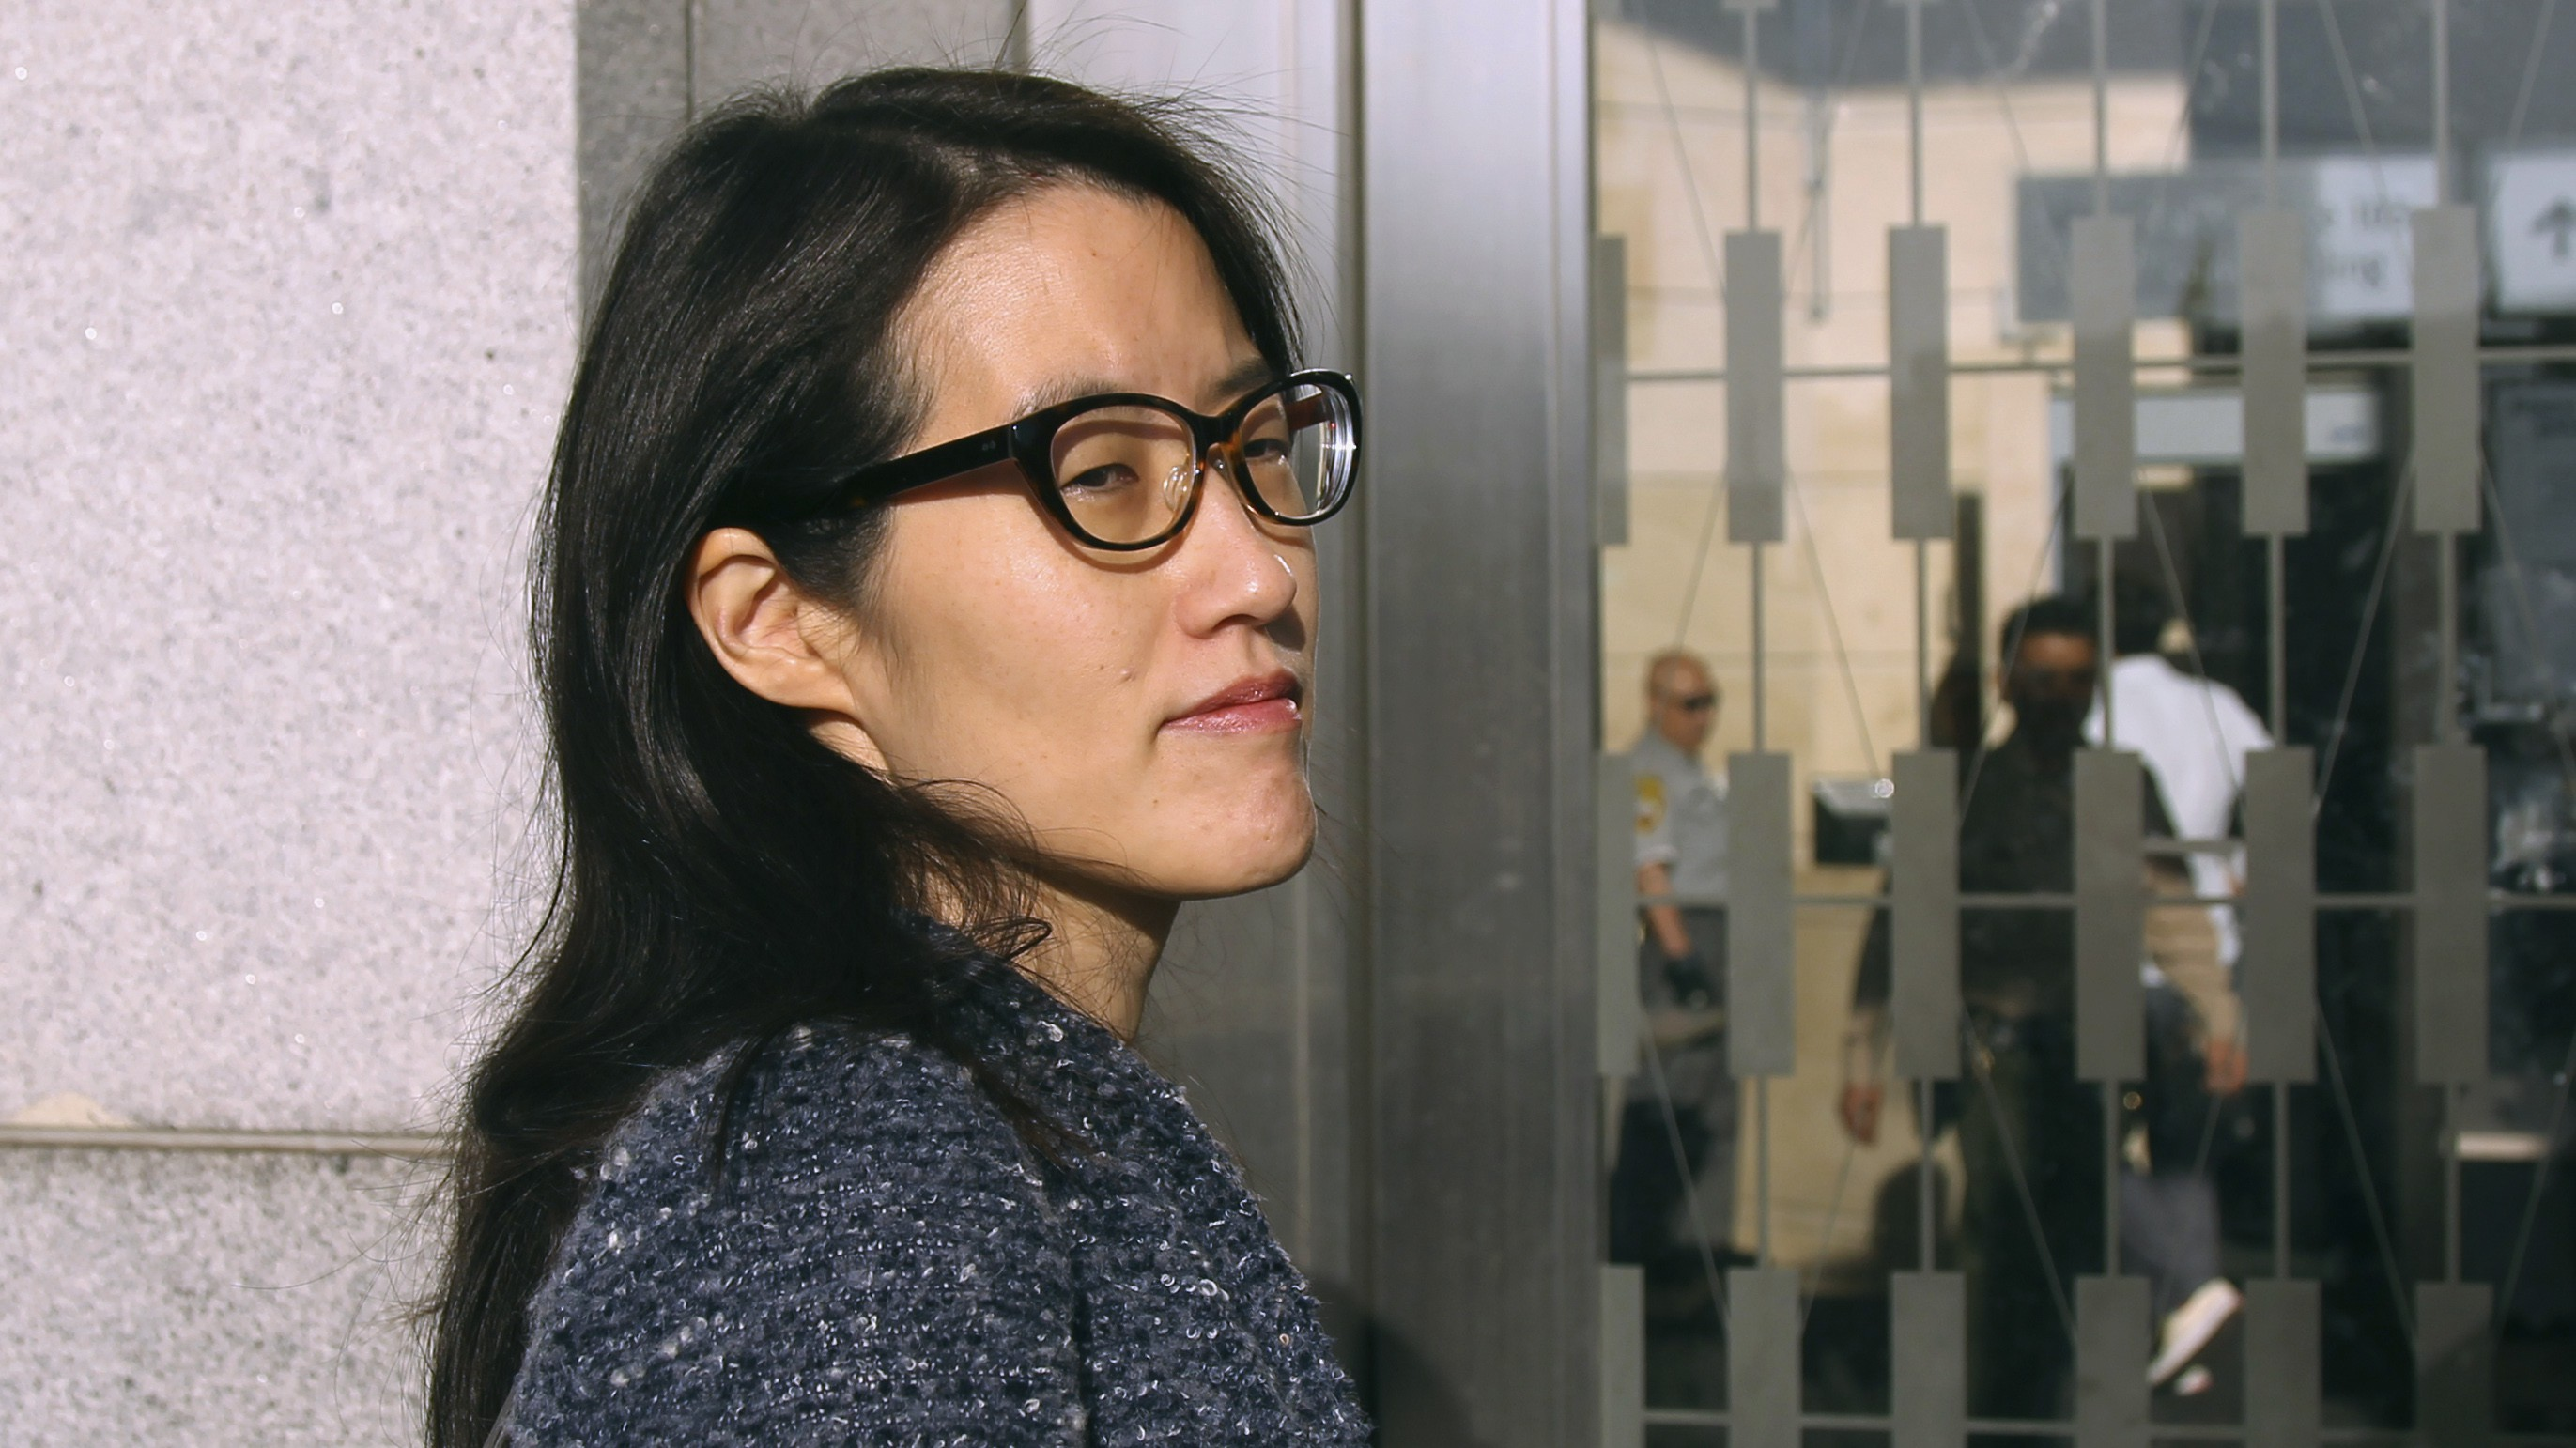 Ellen Pao arrives at San Francisco Superior Court in San Francisco, California March 3, 2015.